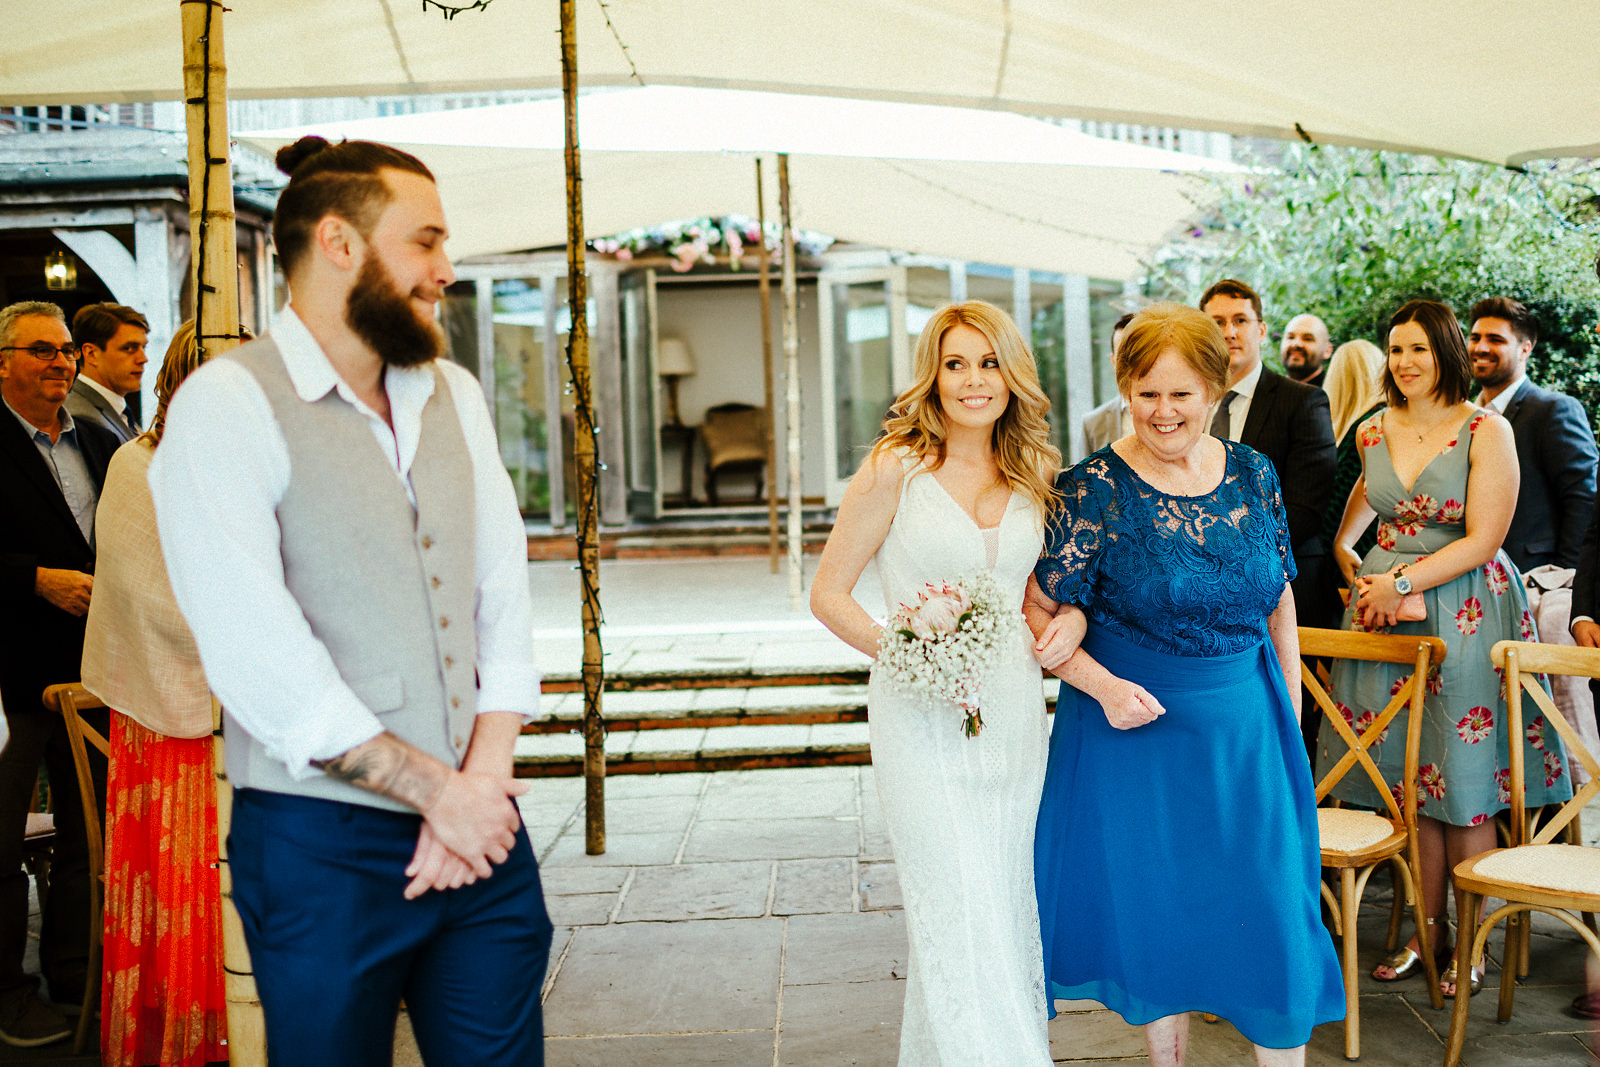 Arrival of the bride at the Copse wedding venue